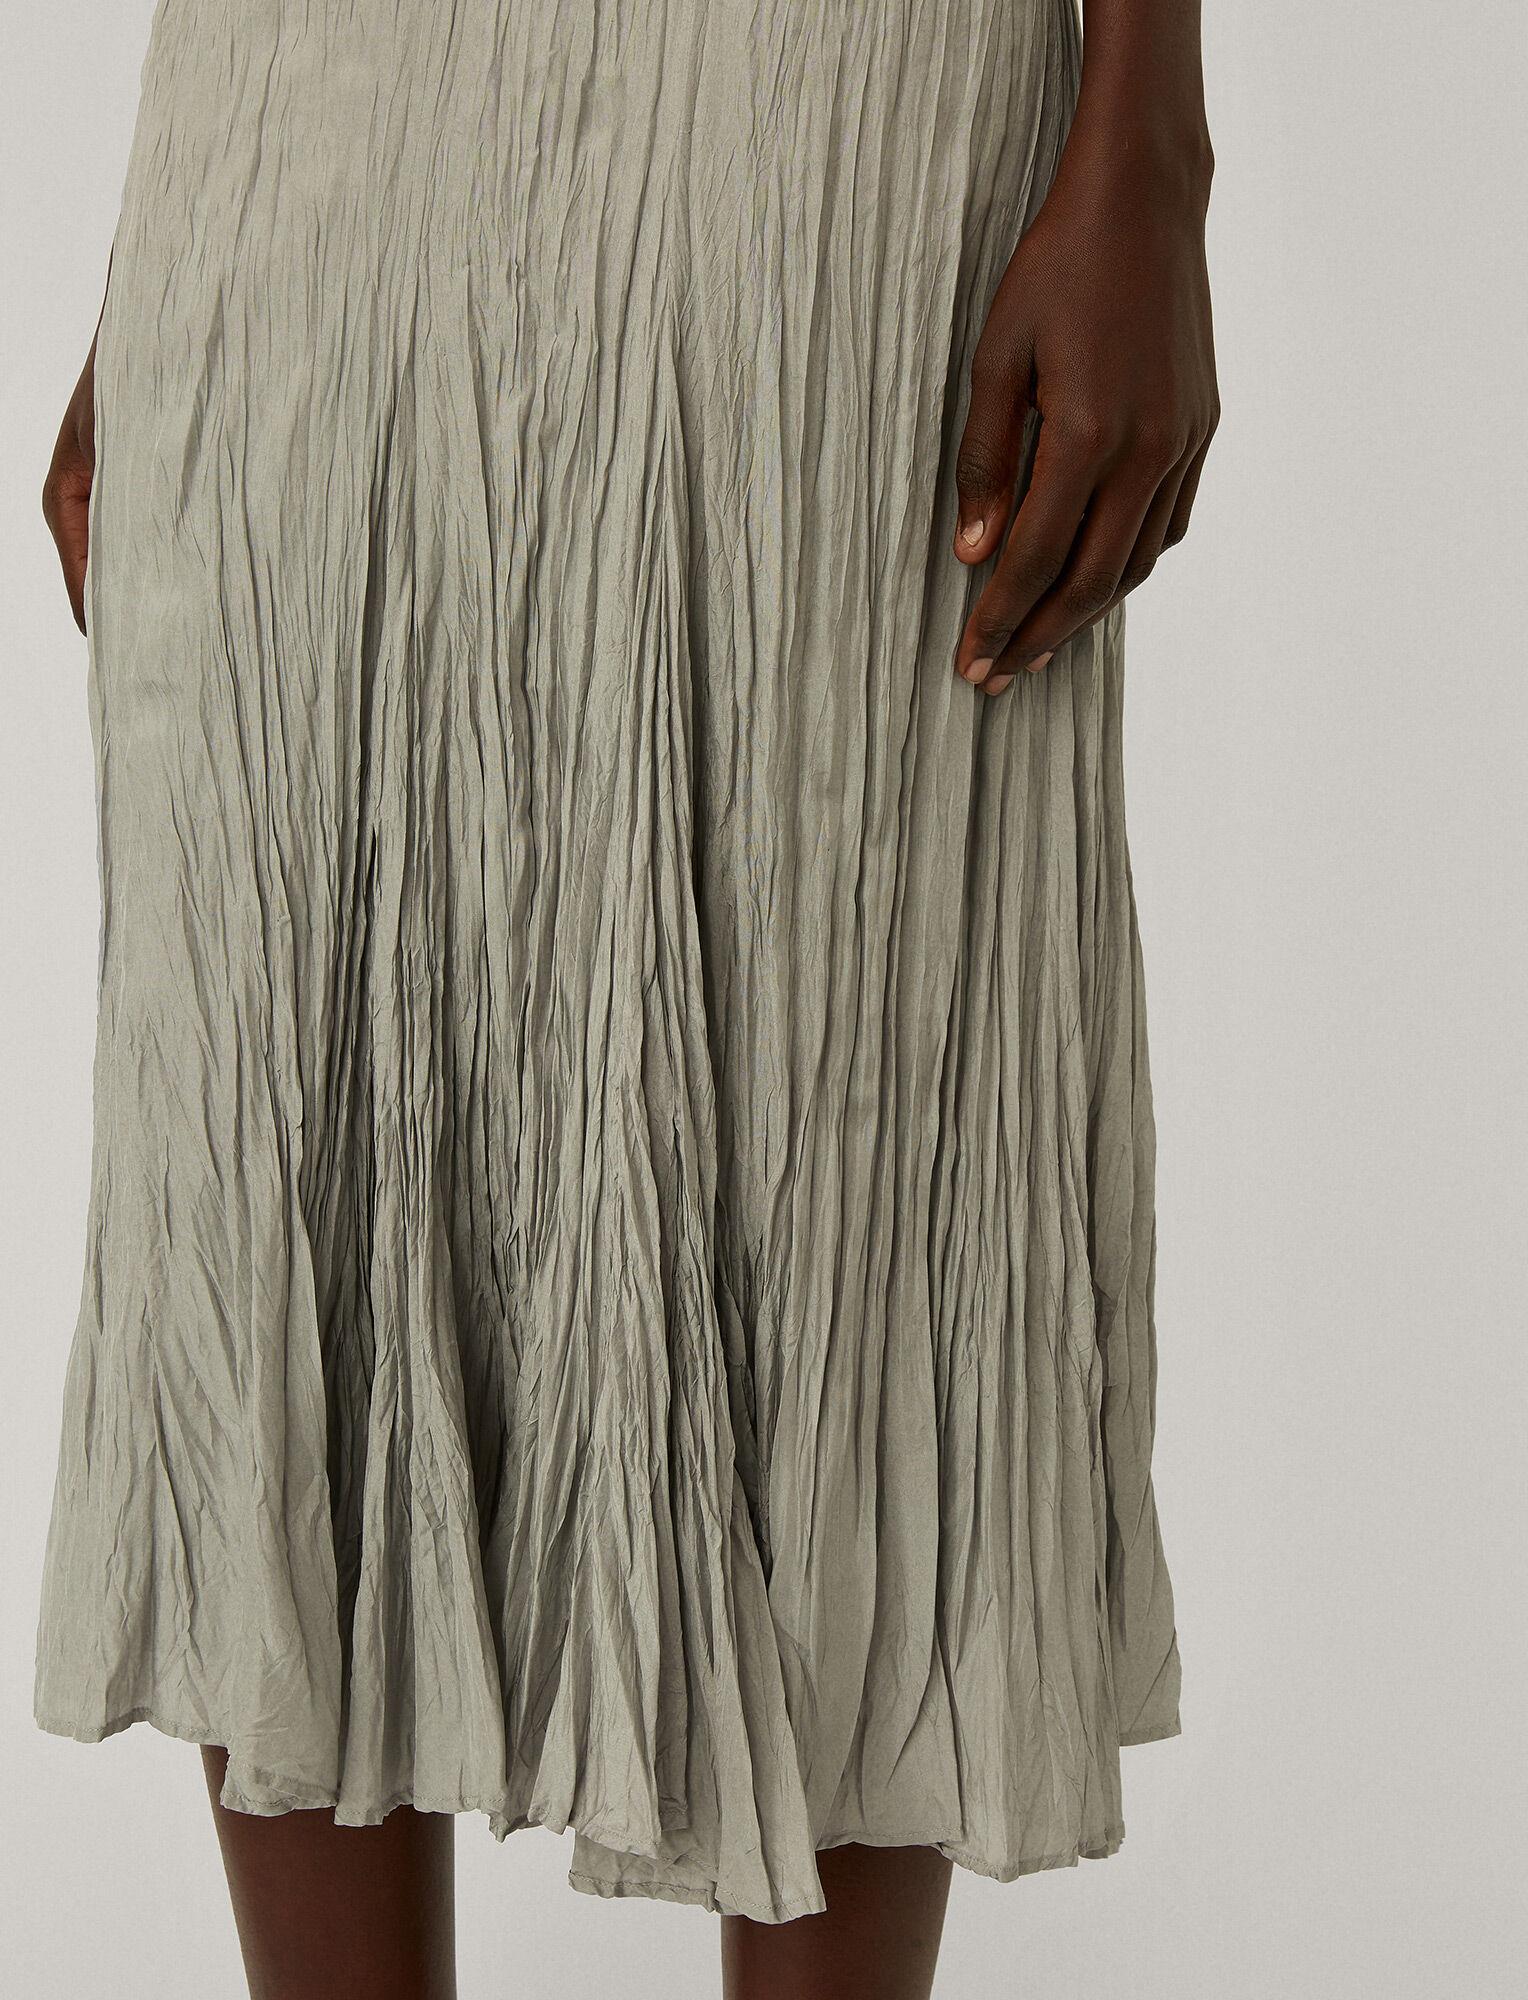 Joseph, Habotai Desvigne Dress, in CLOUD